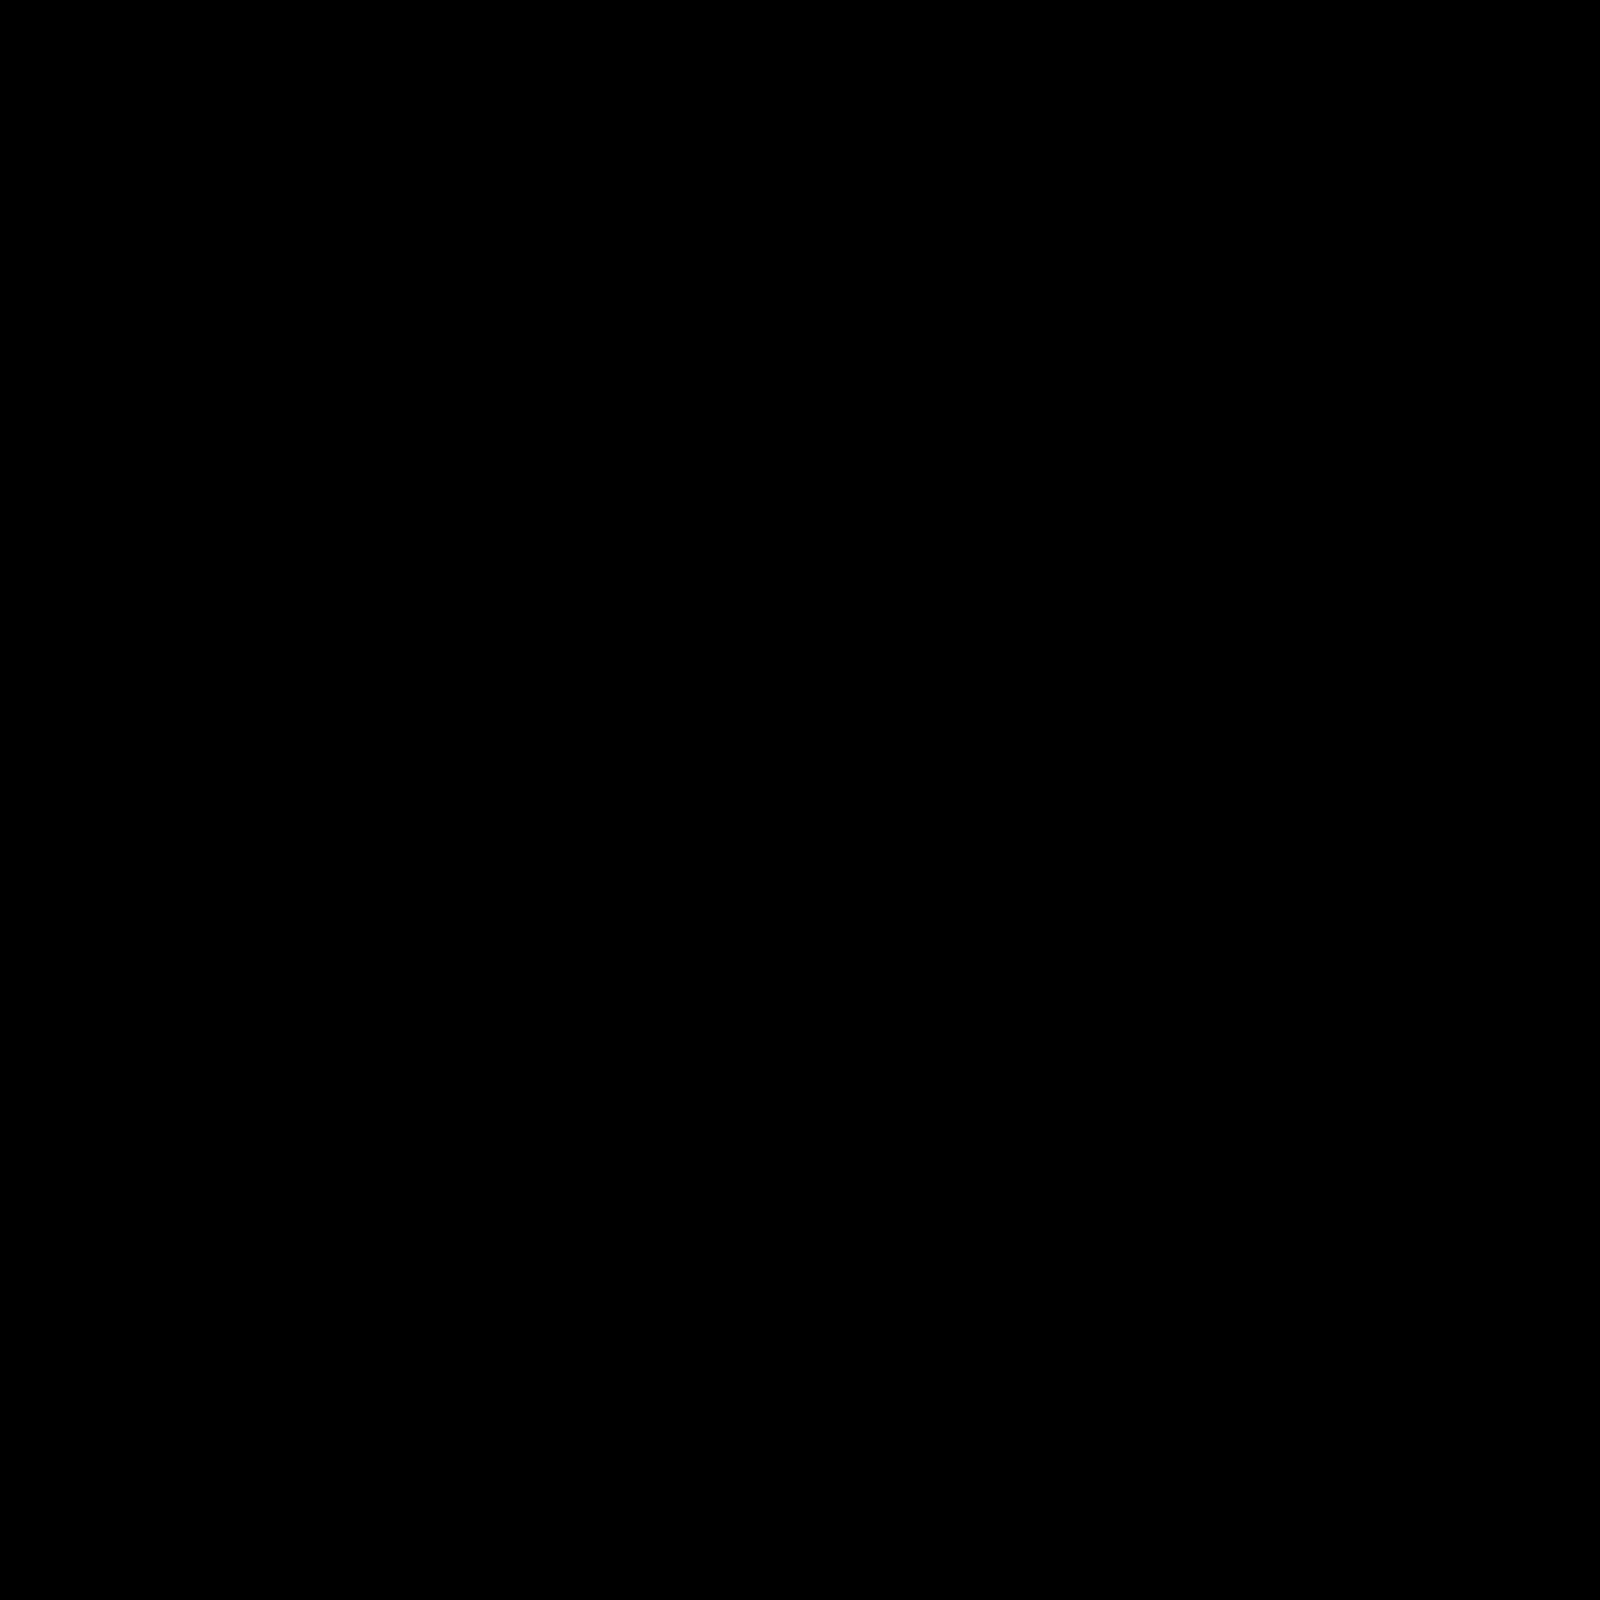 Verzending icon